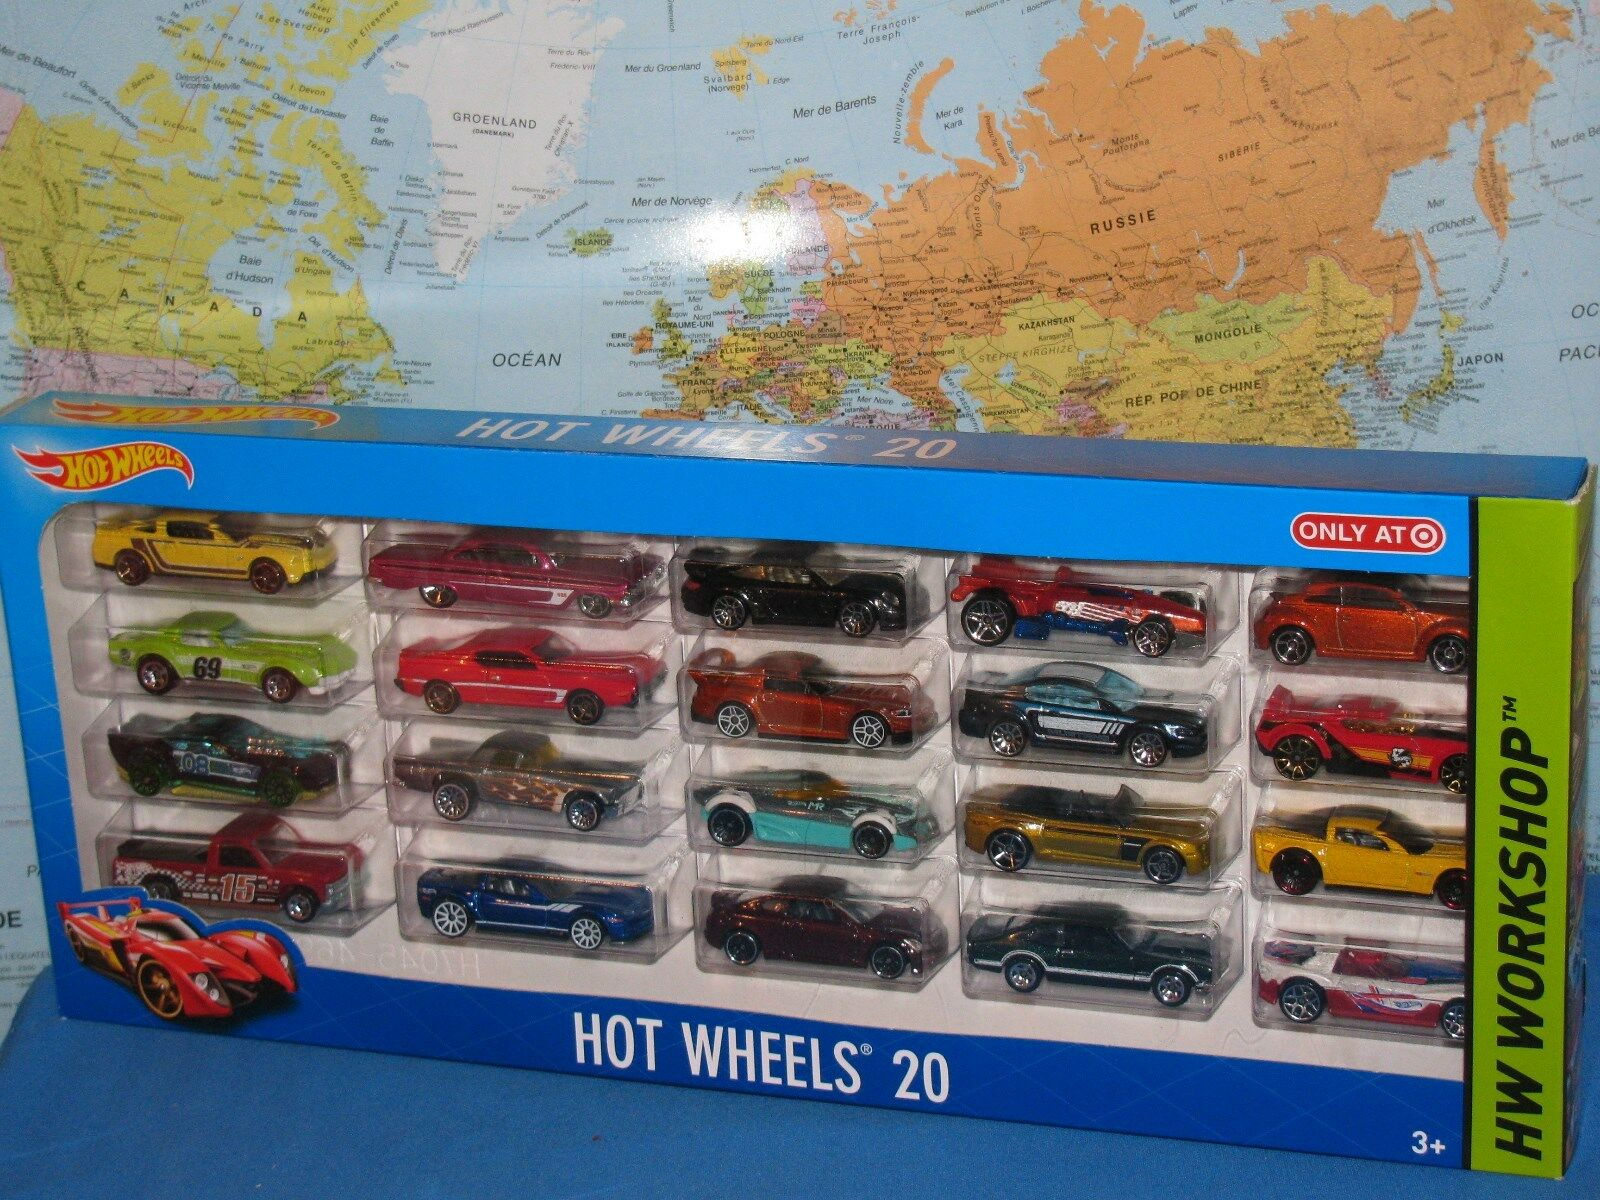 HOT WHEELS HW WORKSHOP SET SET SET OF 20 CARS DIECAST BRAND NEW & VHTF 1c2fca